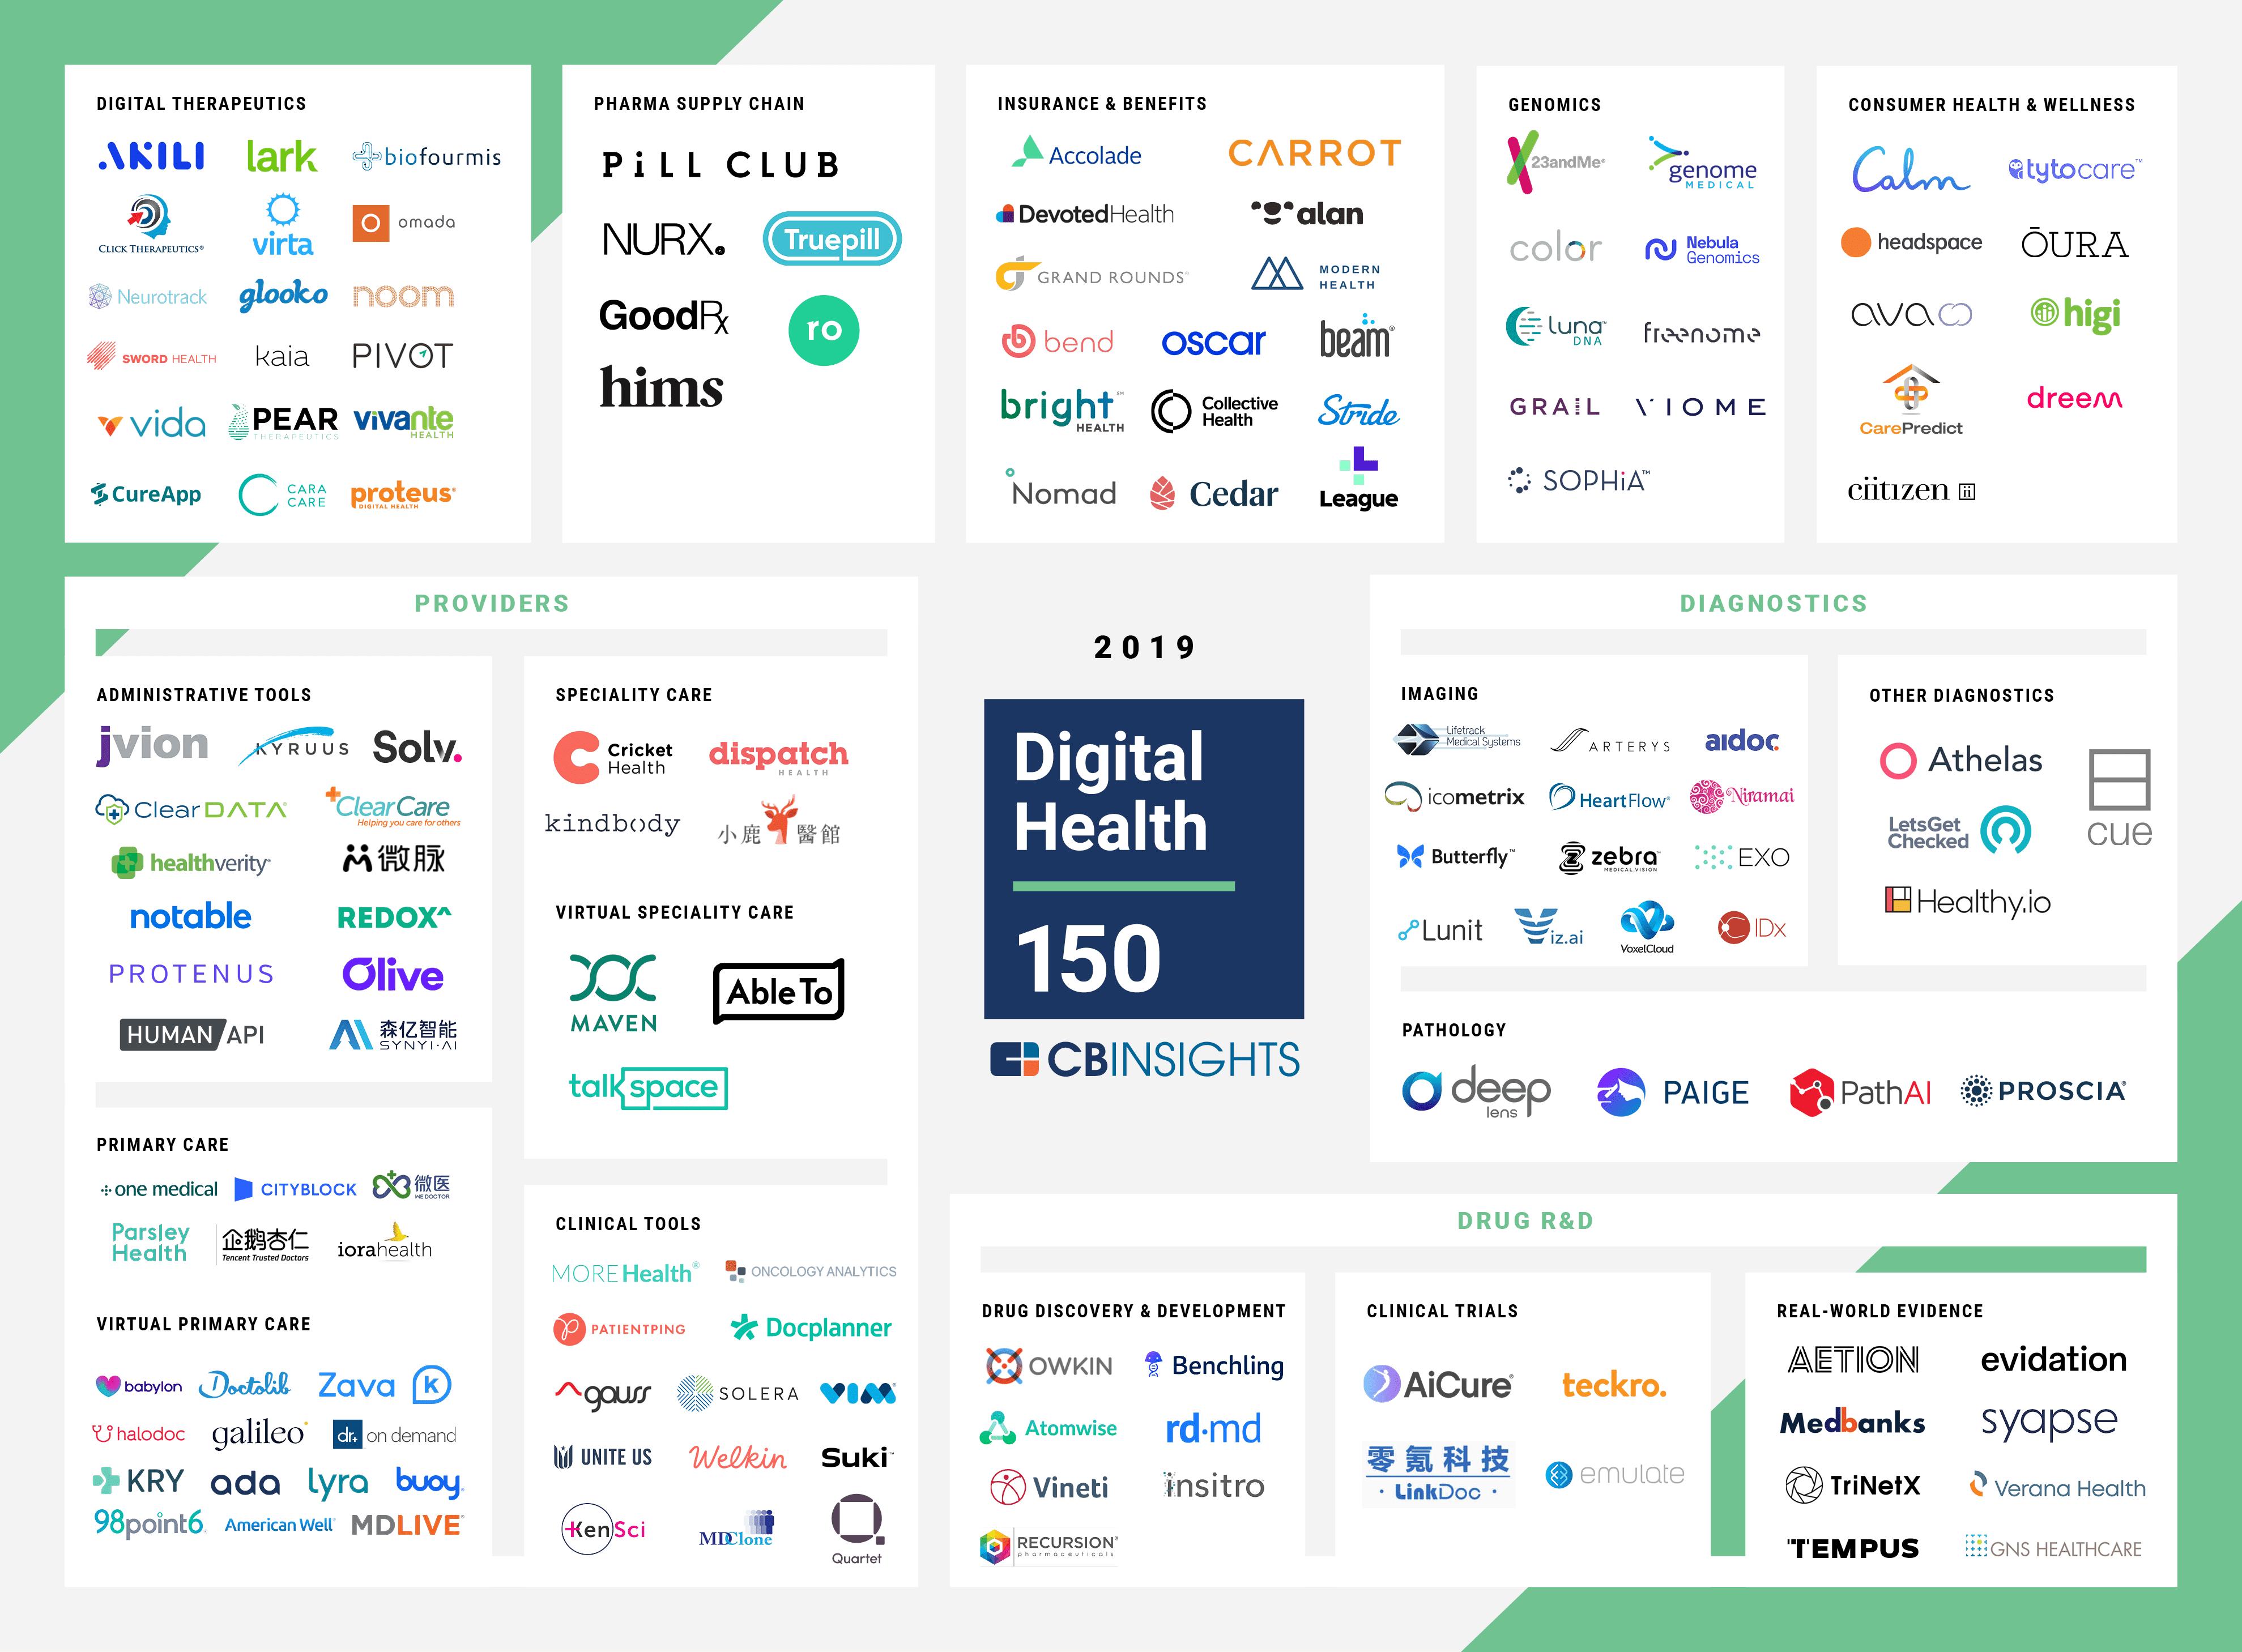 Digital health startups 2019 categorized by main focus area